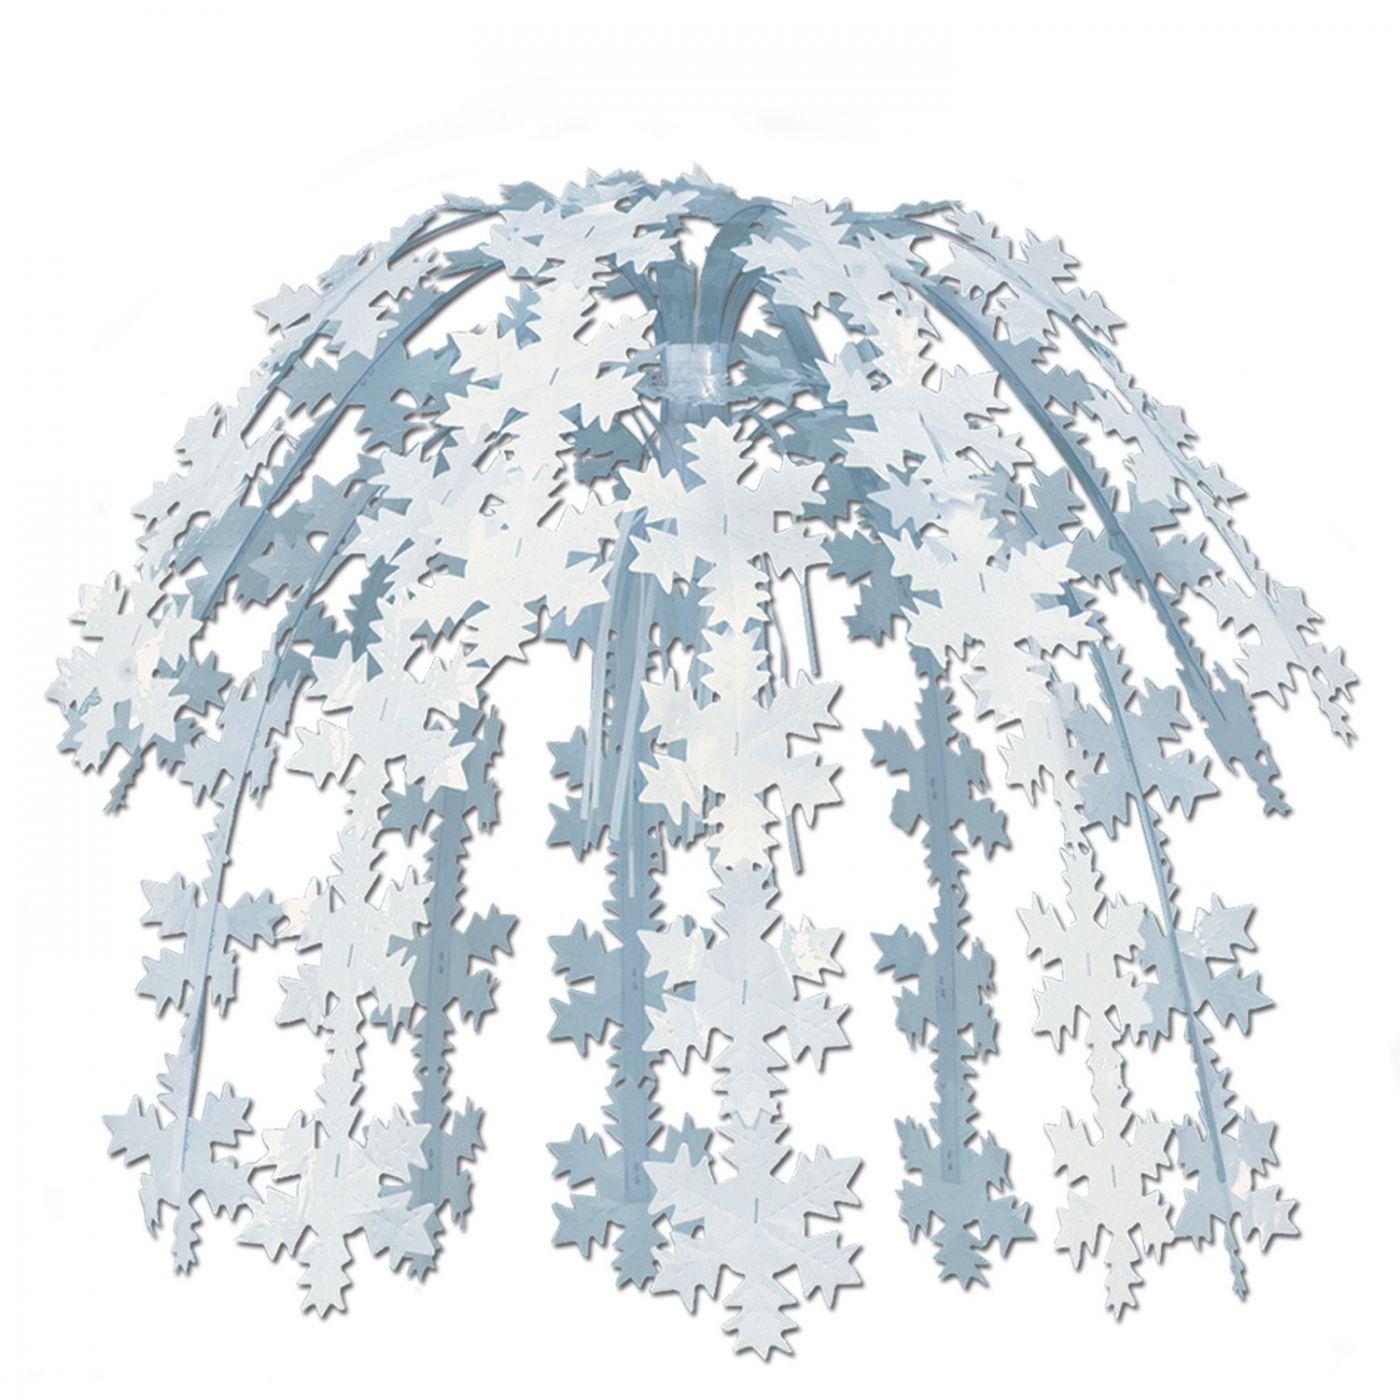 Snowflake Cascade image